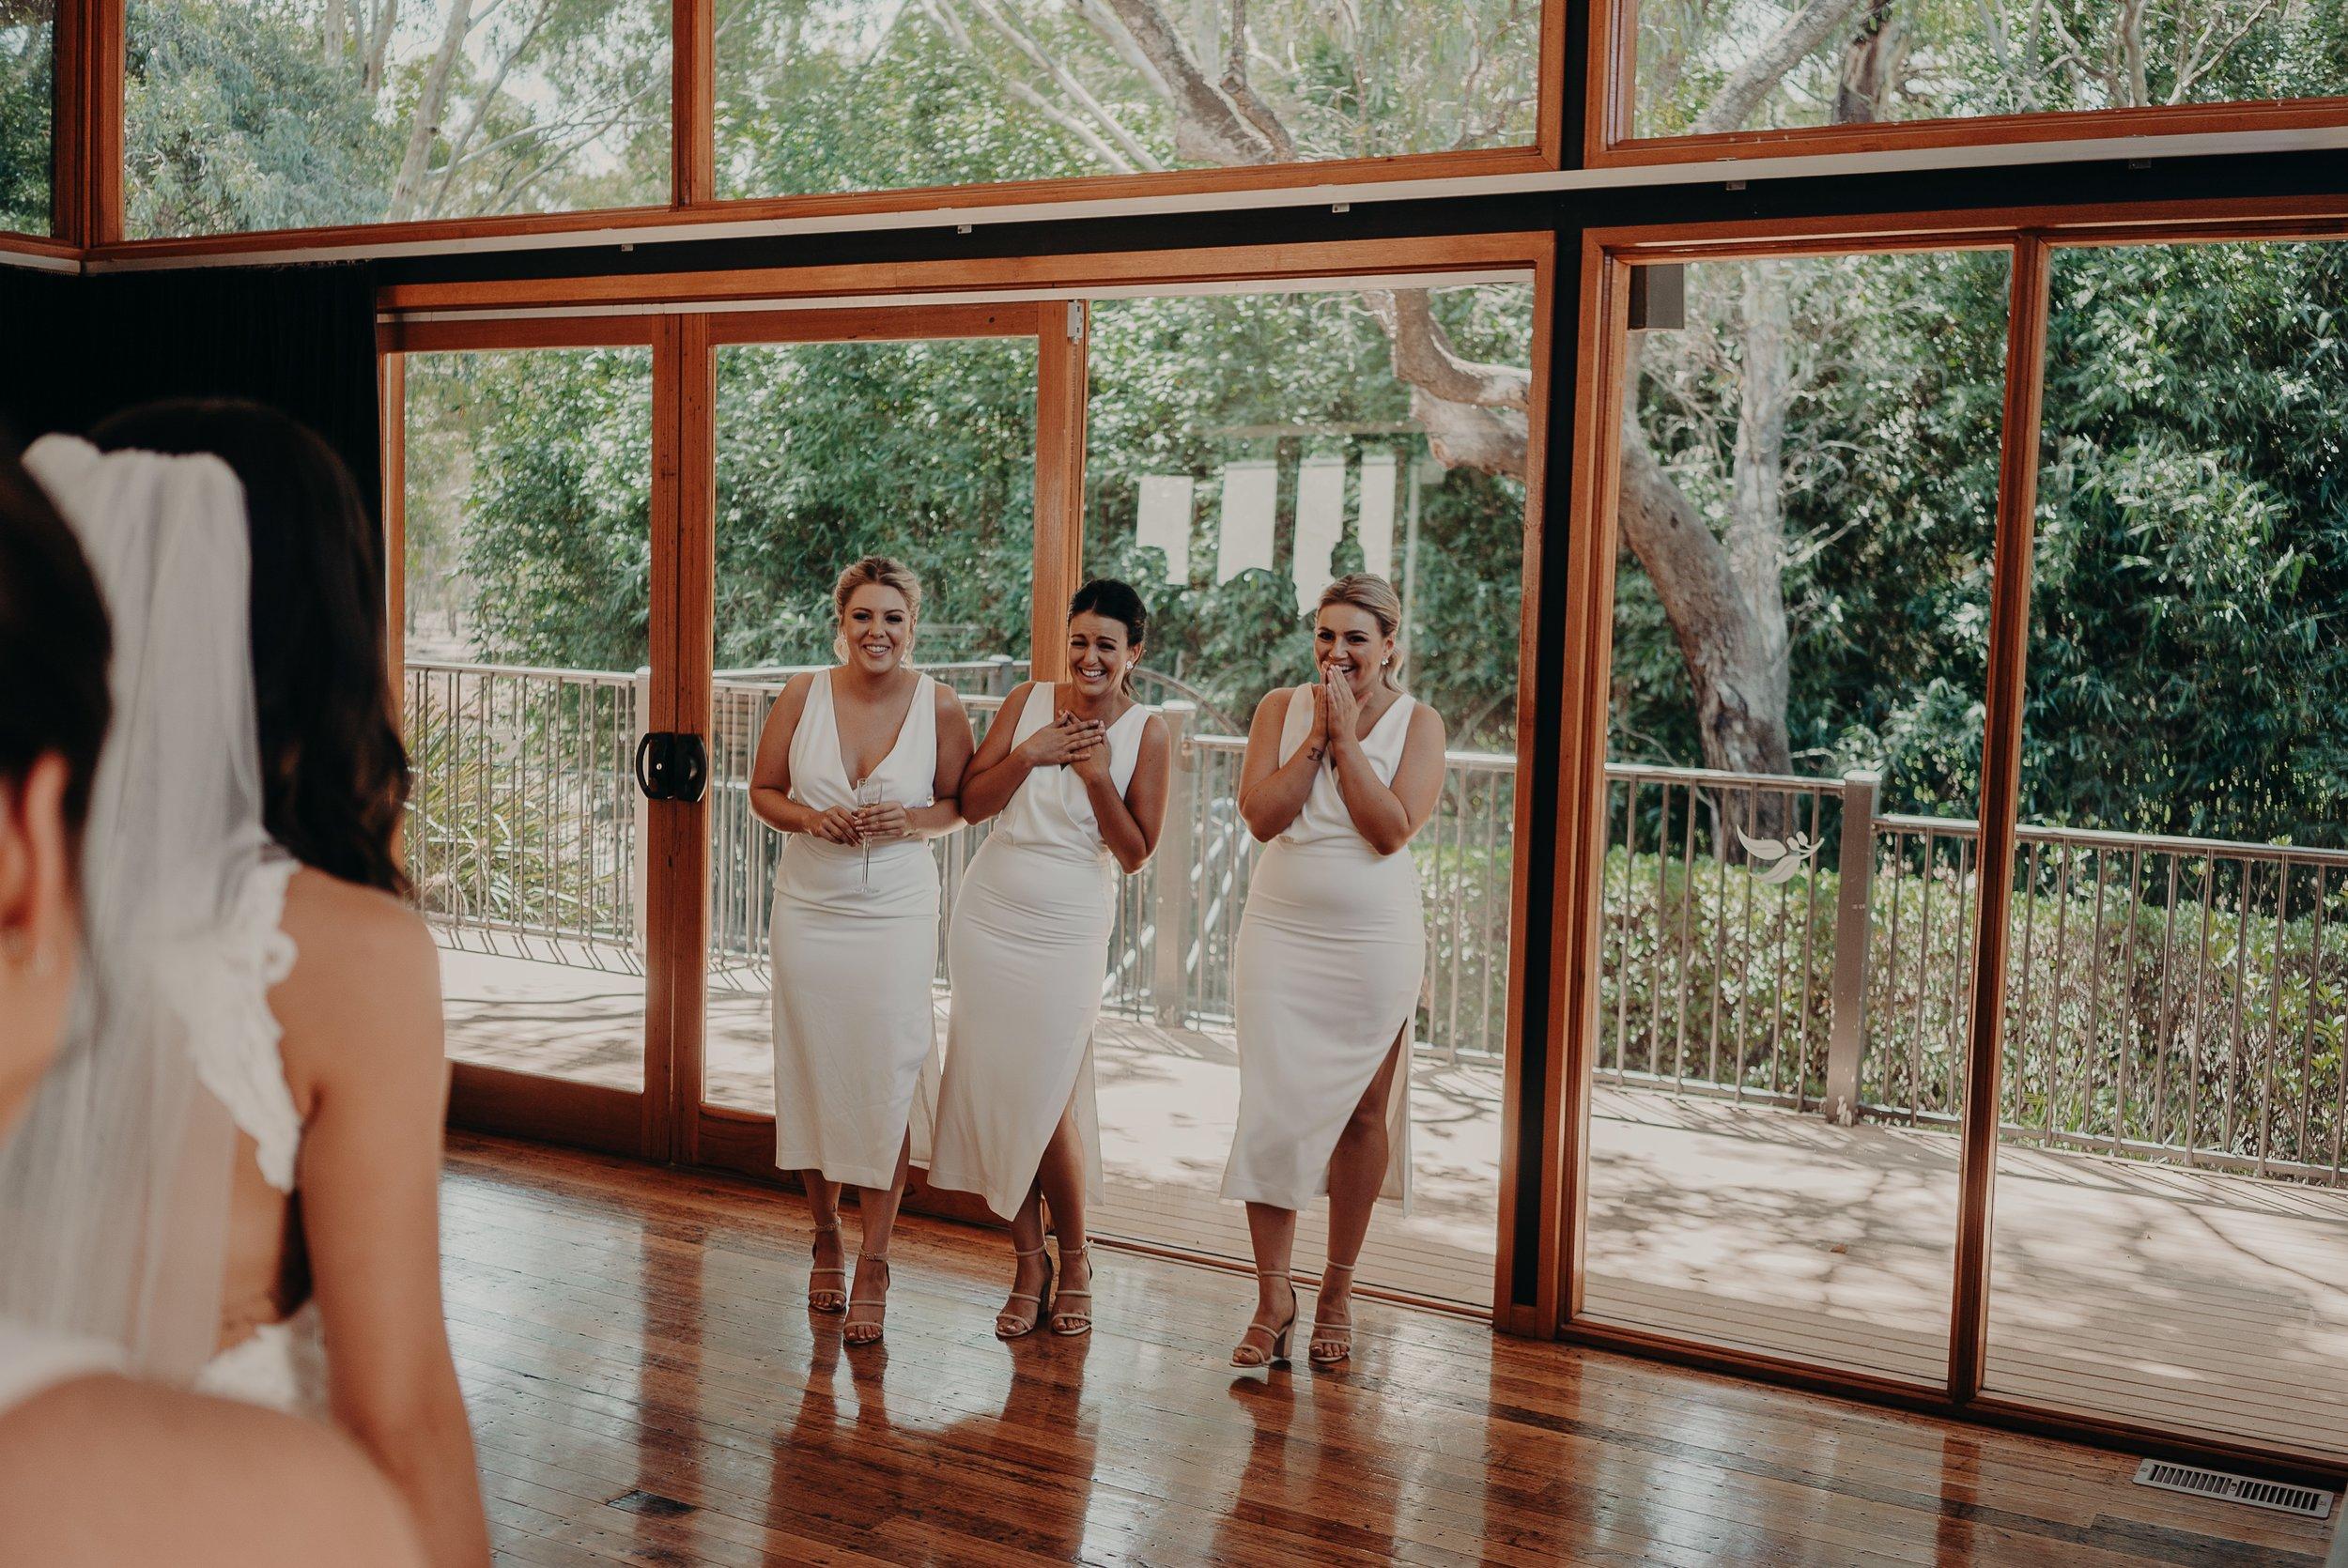 mickalathomas_puremacphotography_weddingphotographer_couplephotographer_Sheppartonphotographer_2704.jpg